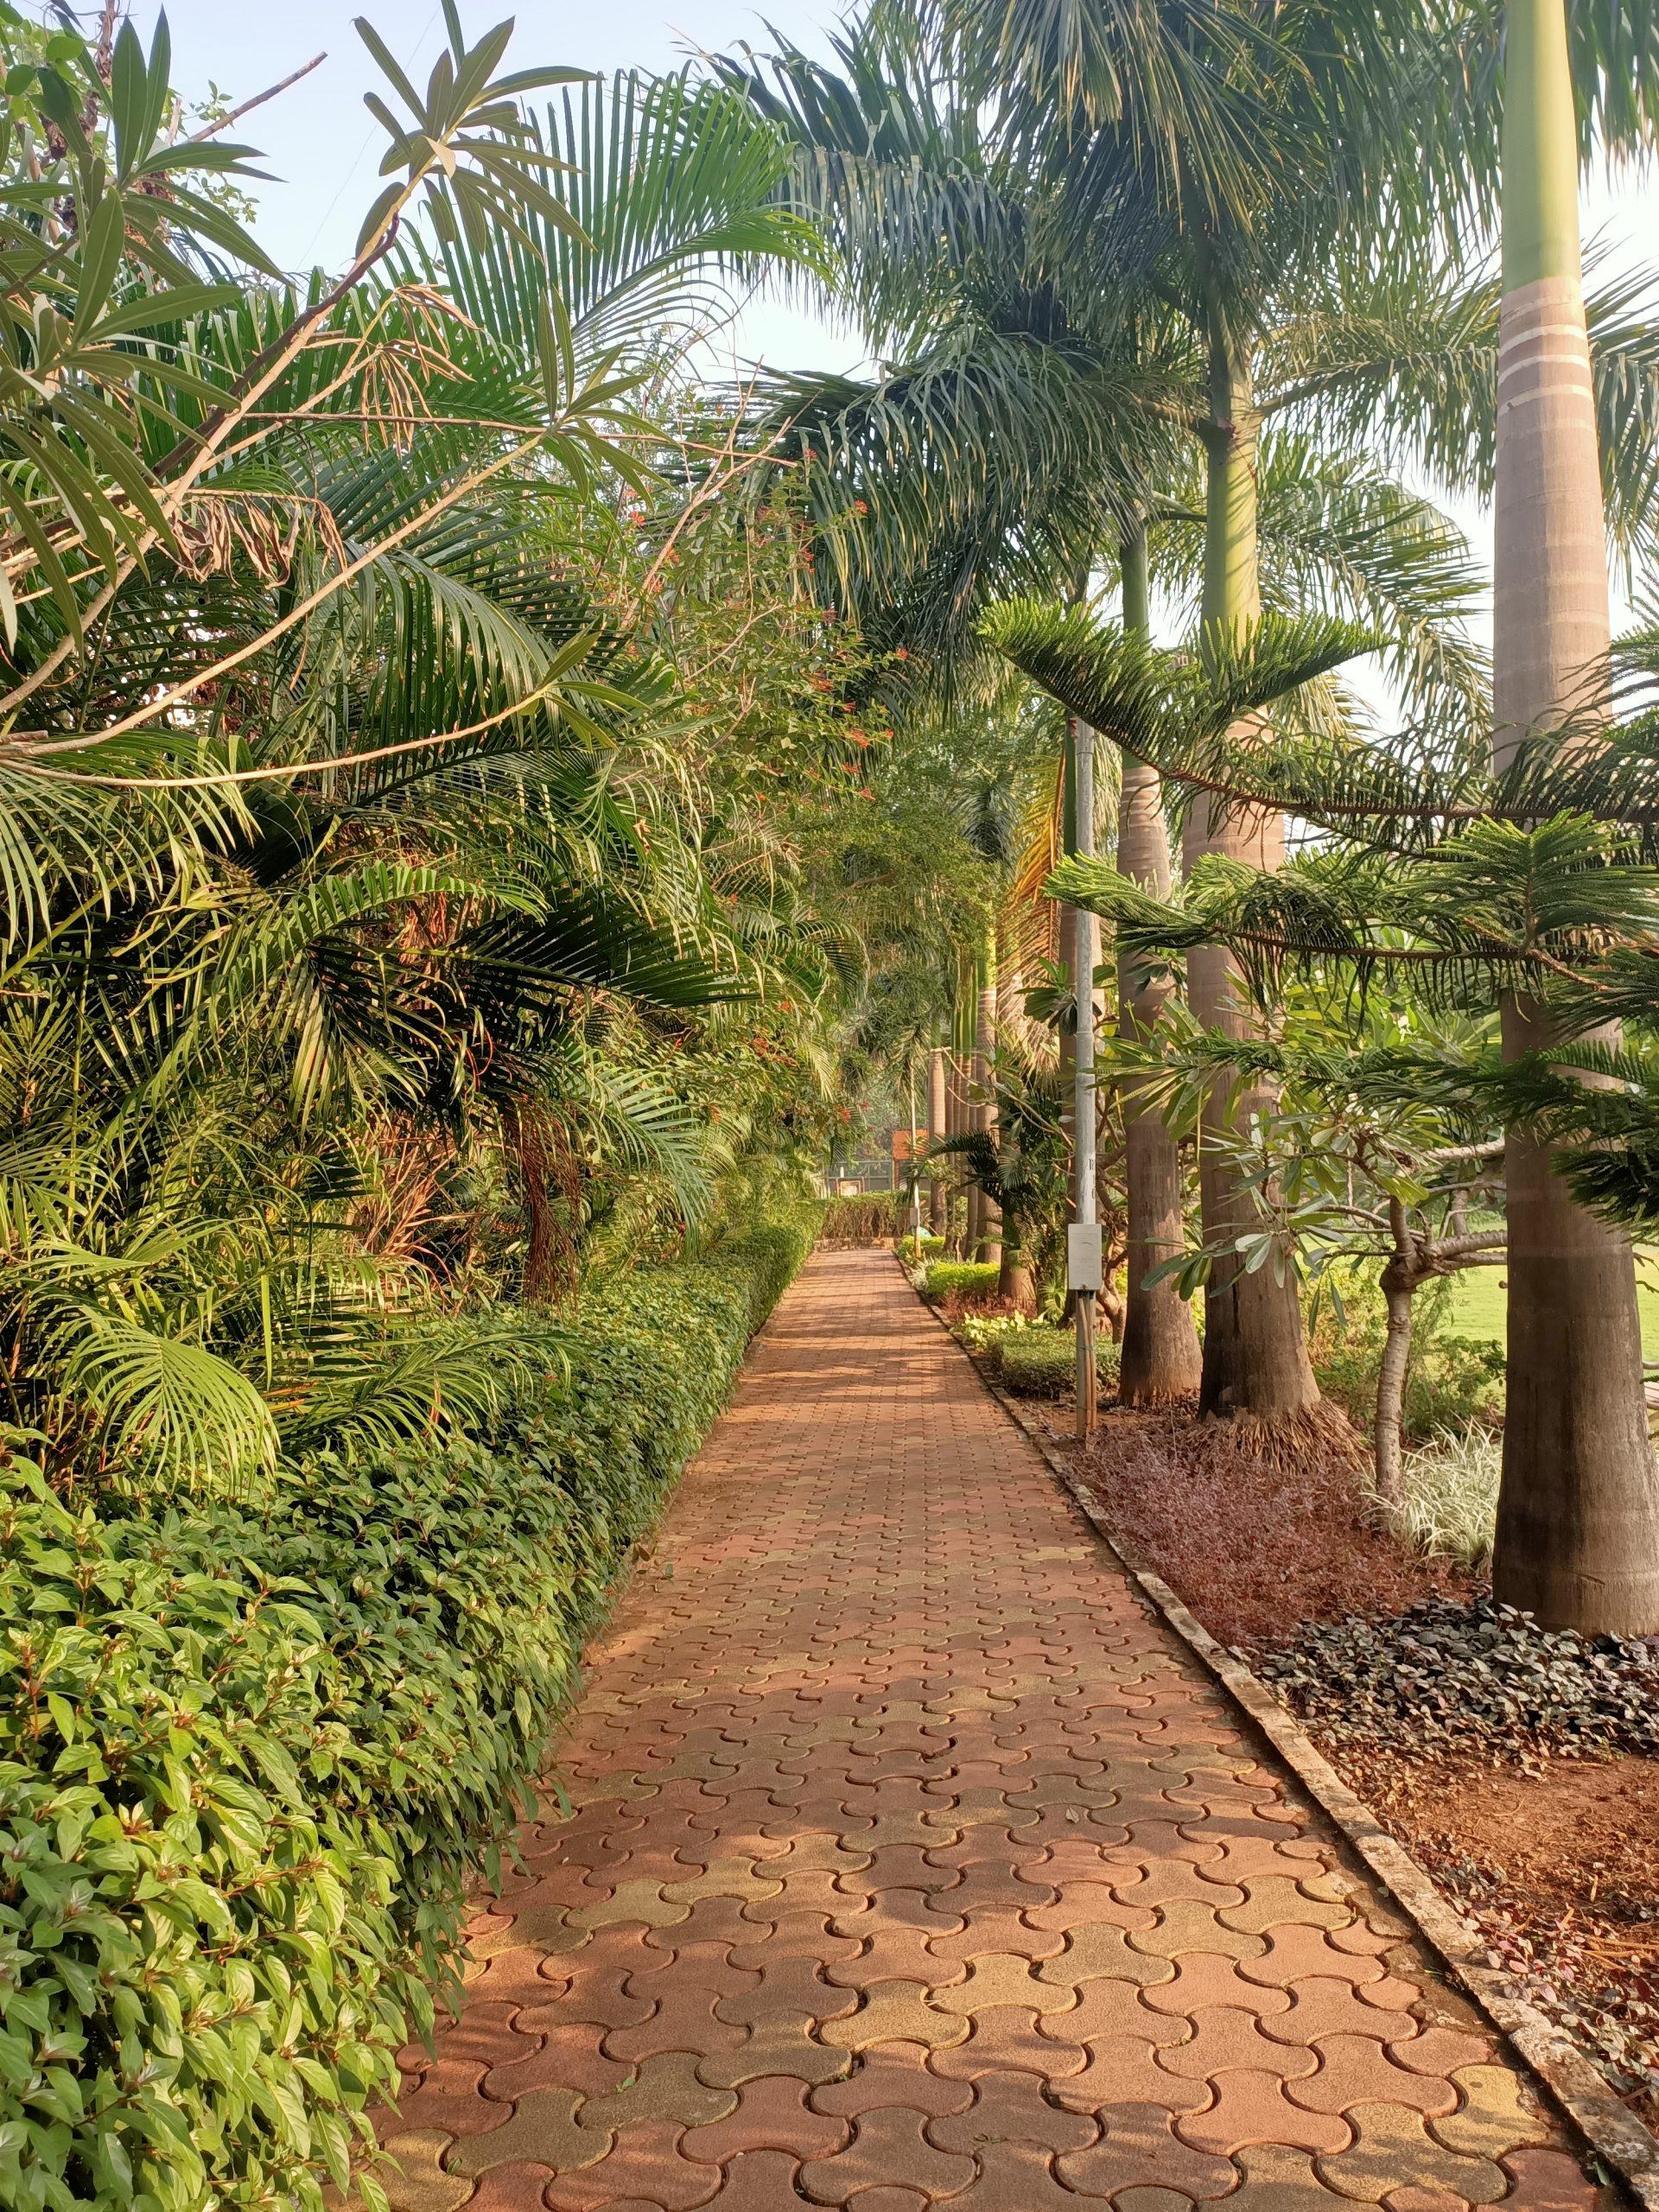 walking track in garden